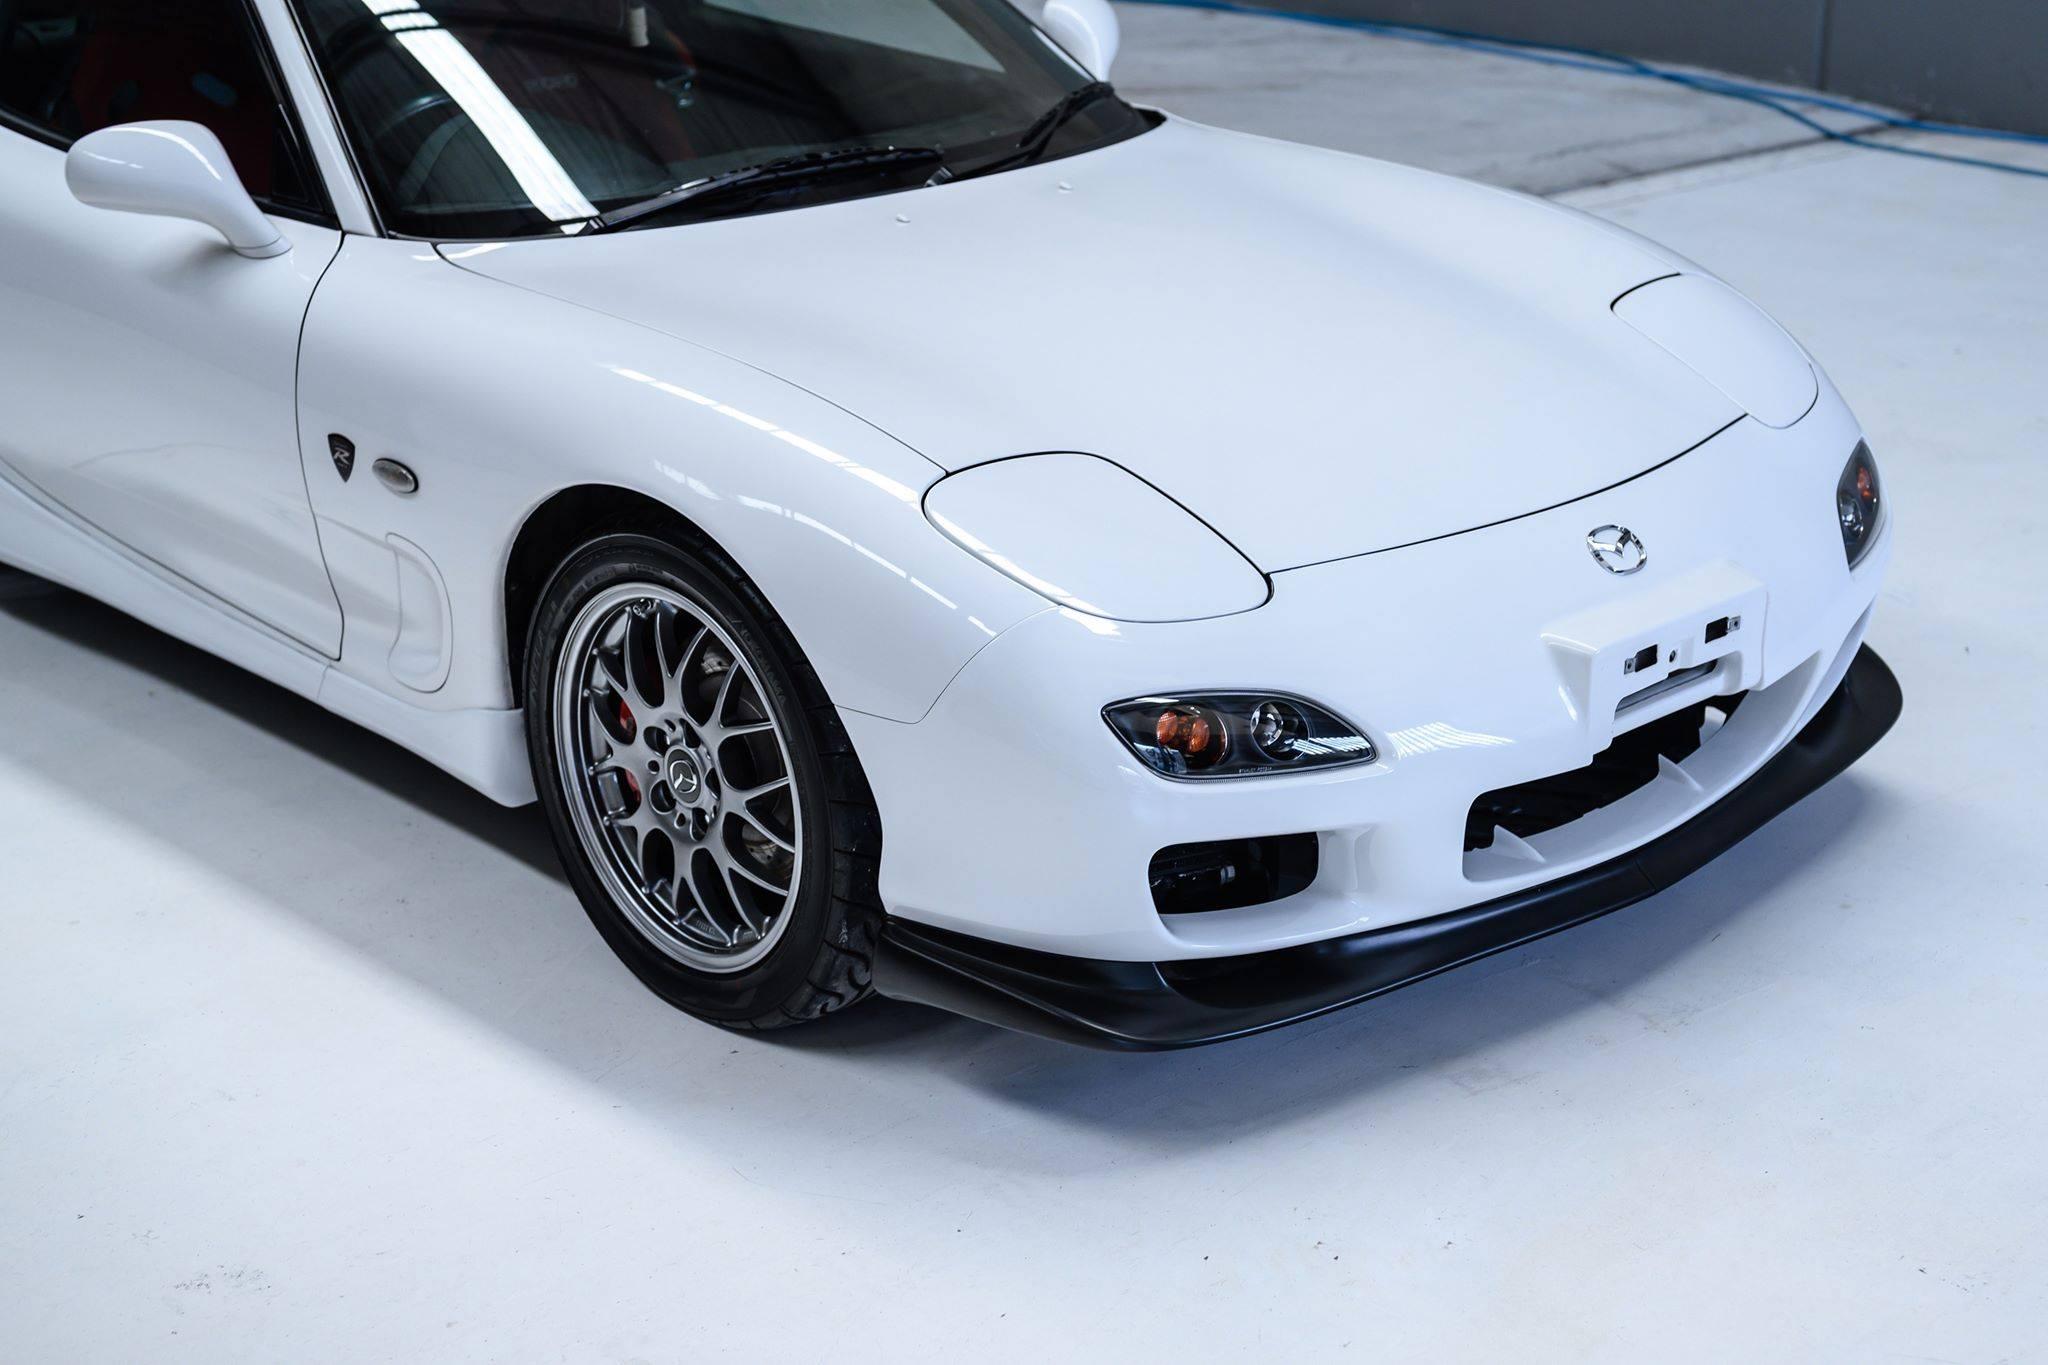 2002_Mazda_RX-7_Spirit-R_Type-A_sale_0007